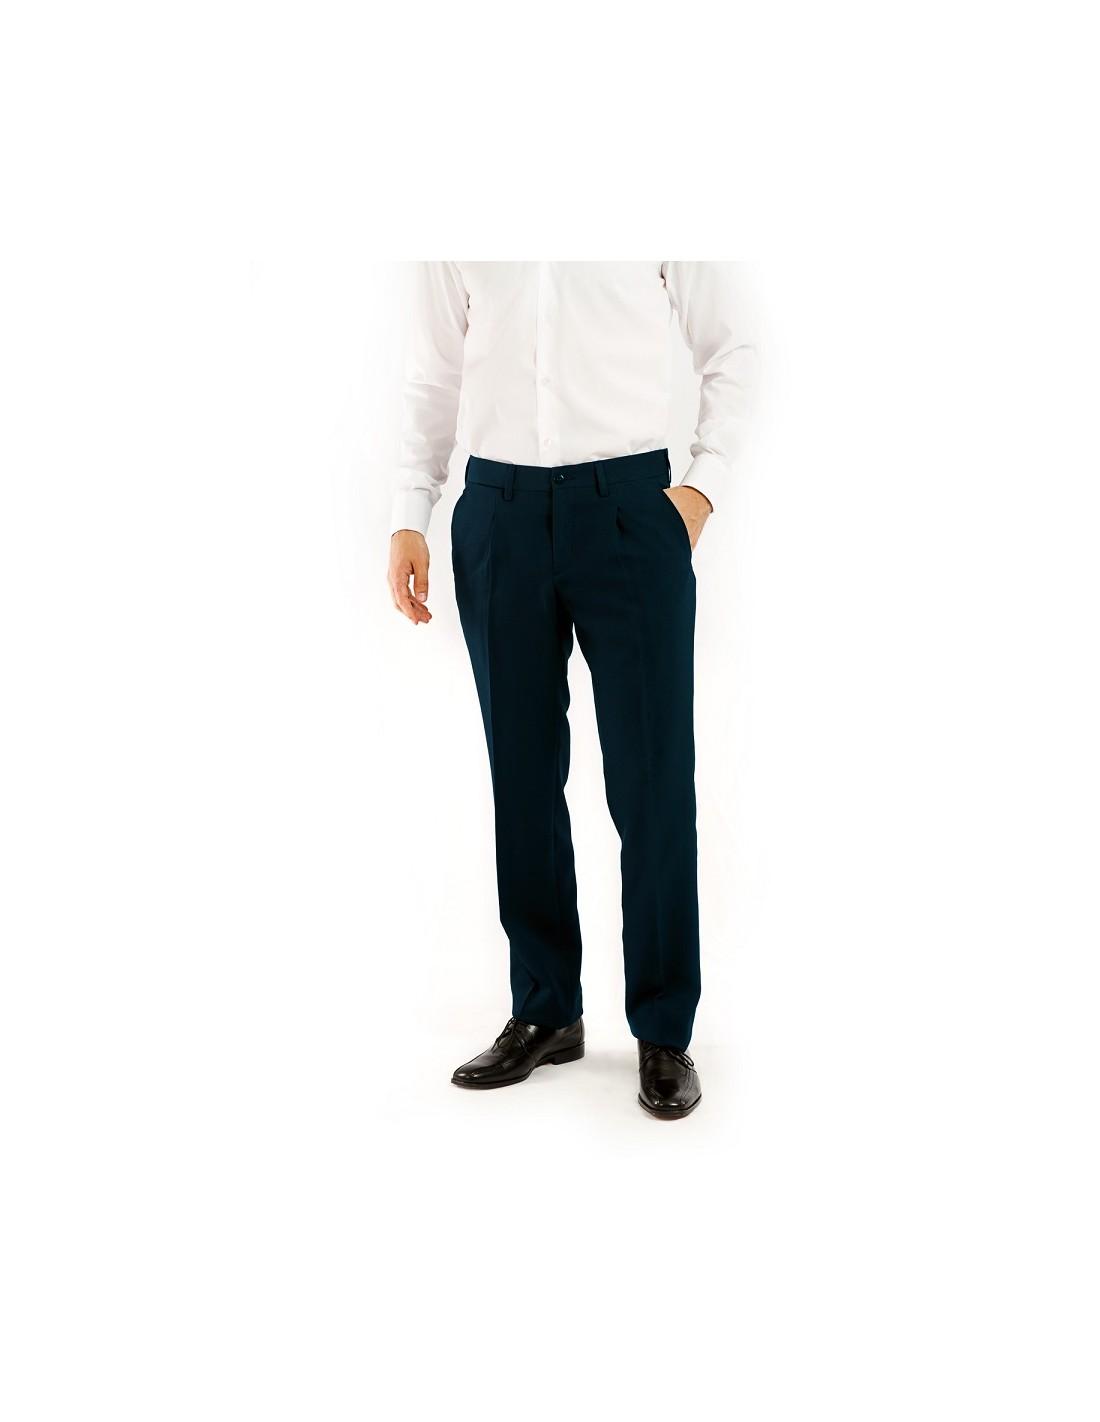 Pantalon Caballero Vestir 103 6179 Tallas Grandes Talla 60 Color Marino